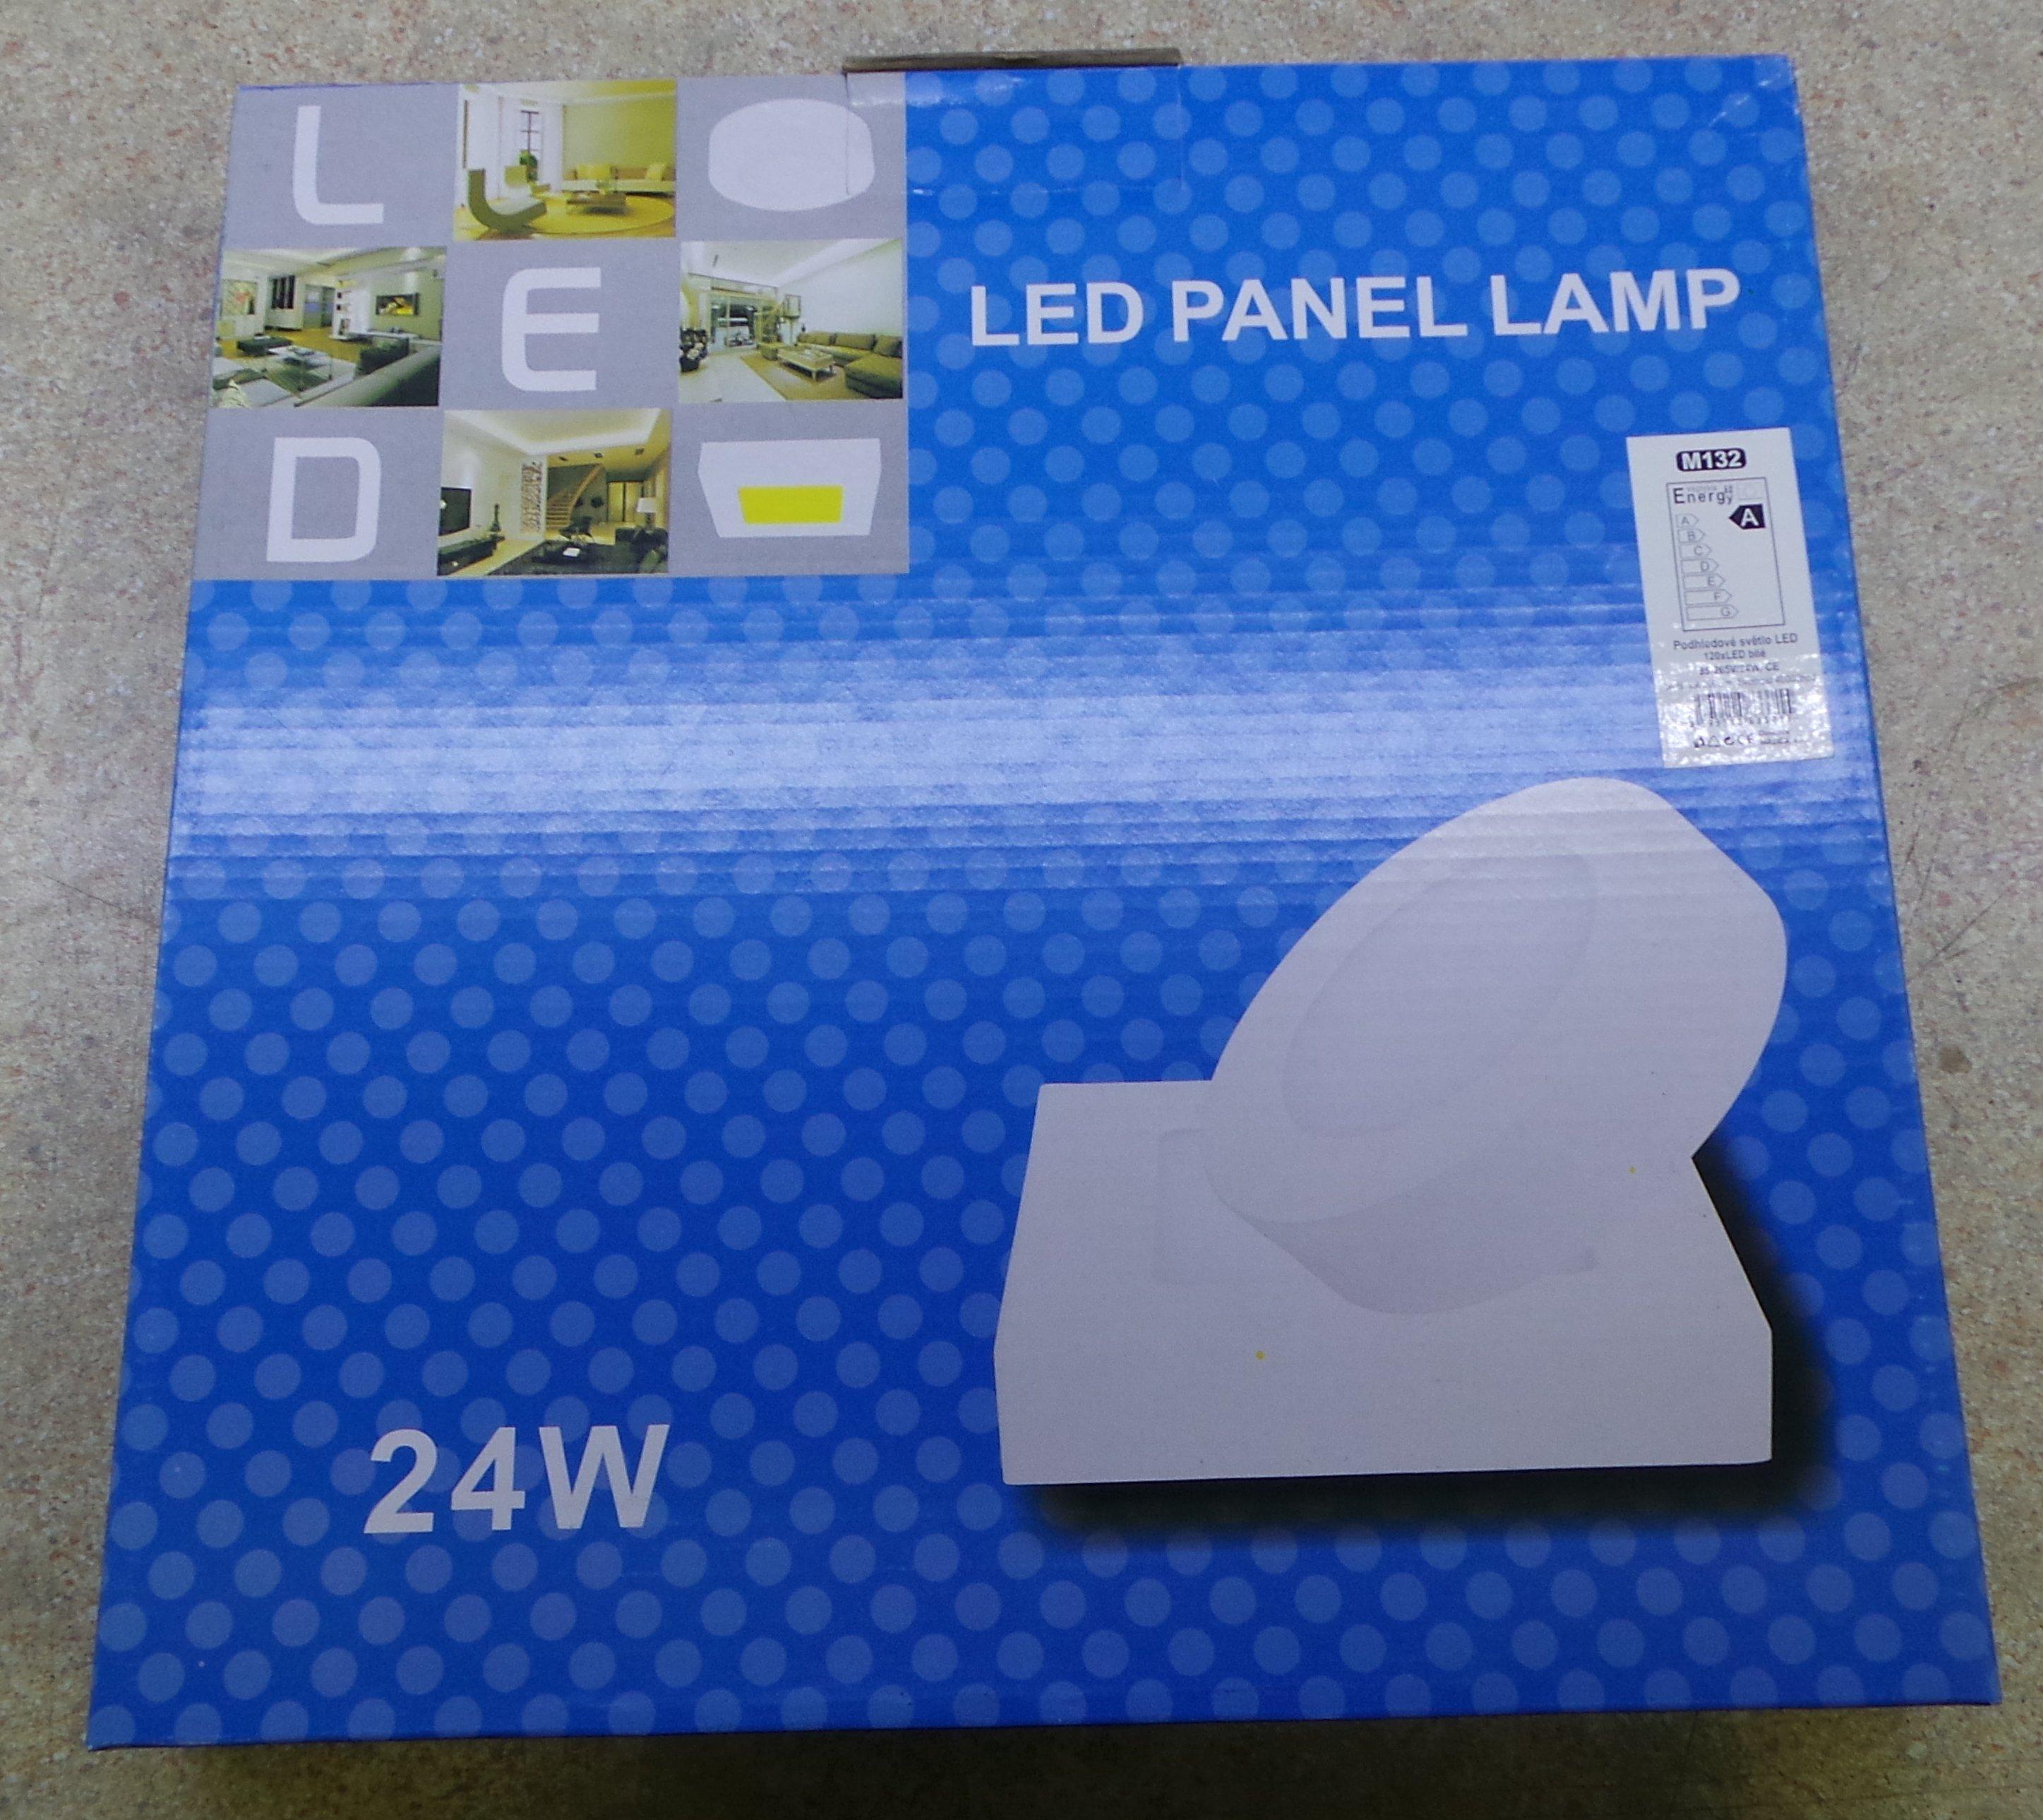 ceiling-light-led-24w-300x300mm-day-white-230v-24w-surface-mount Verwunderlich Gu 5.3 Led 230v Dekorationen